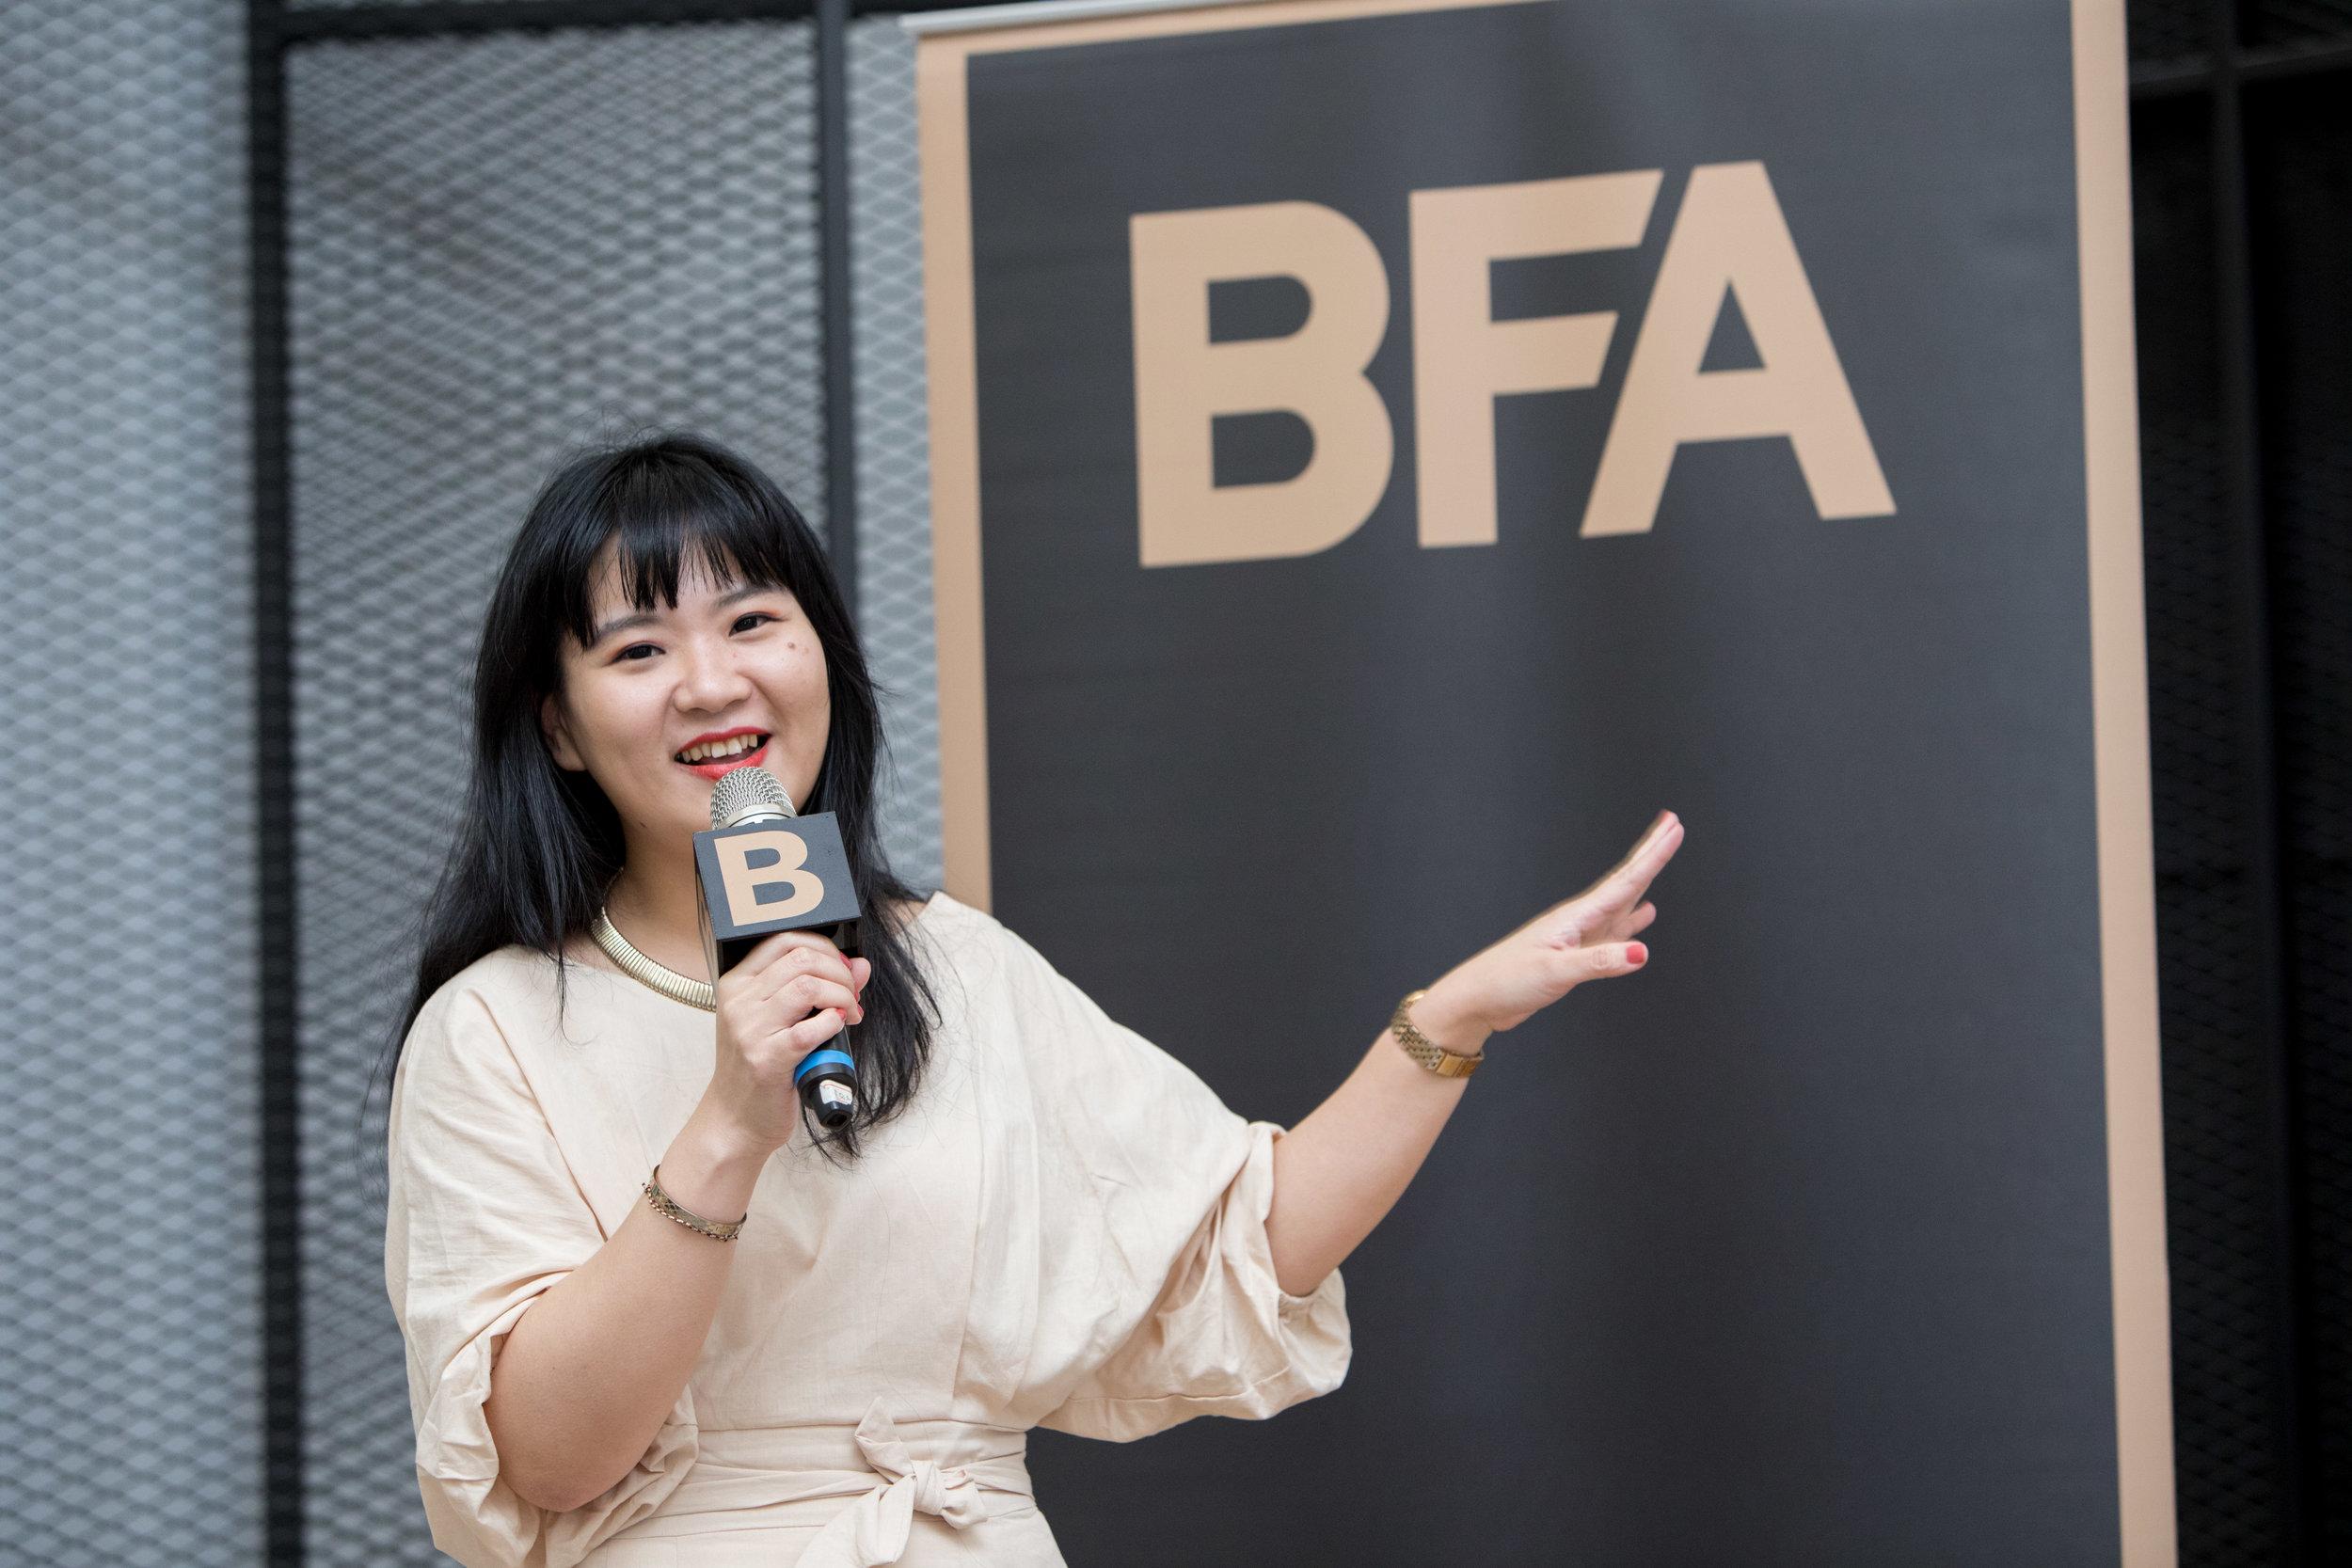 Marie Claire 美麗佳人國際中文版資深整合行銷經理 陳佩婷 Bella:走一趟英雄旅程,回歸最真實的自己